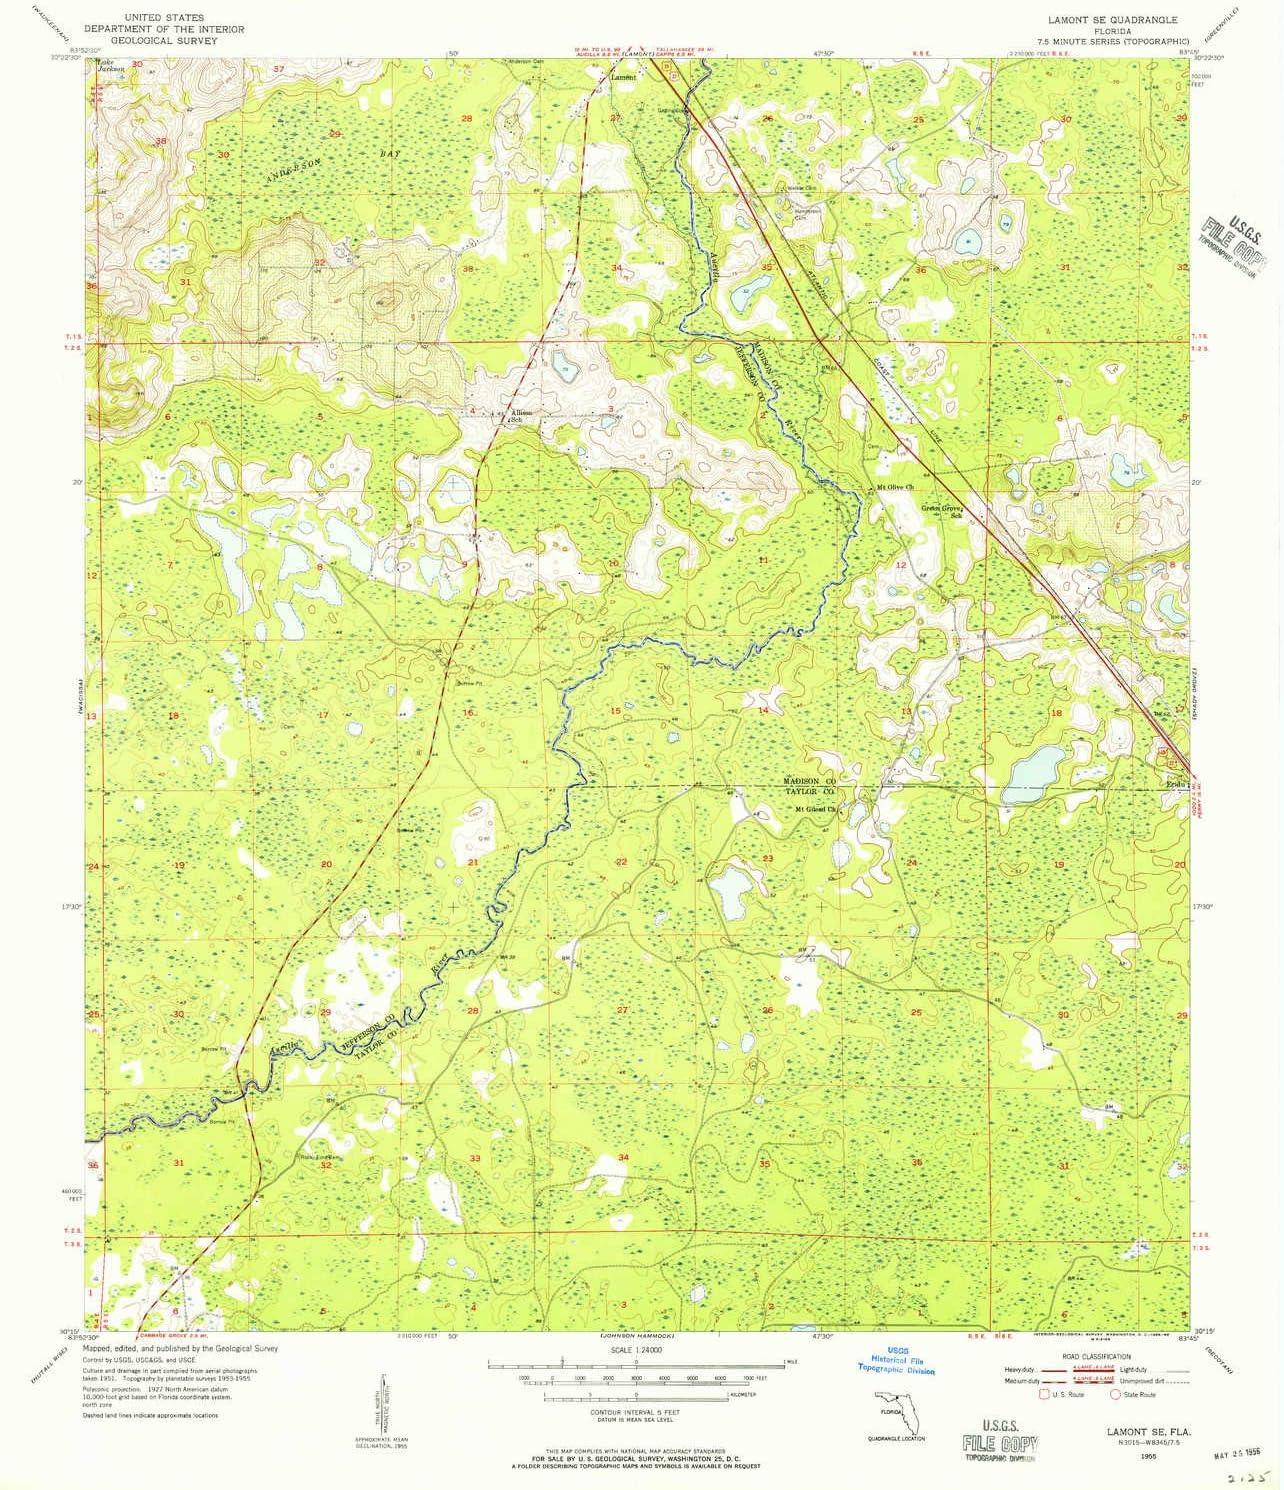 YellowMaps Lamont SE FL topo map Rare latest Minut Scale 7.5 X 1:24000